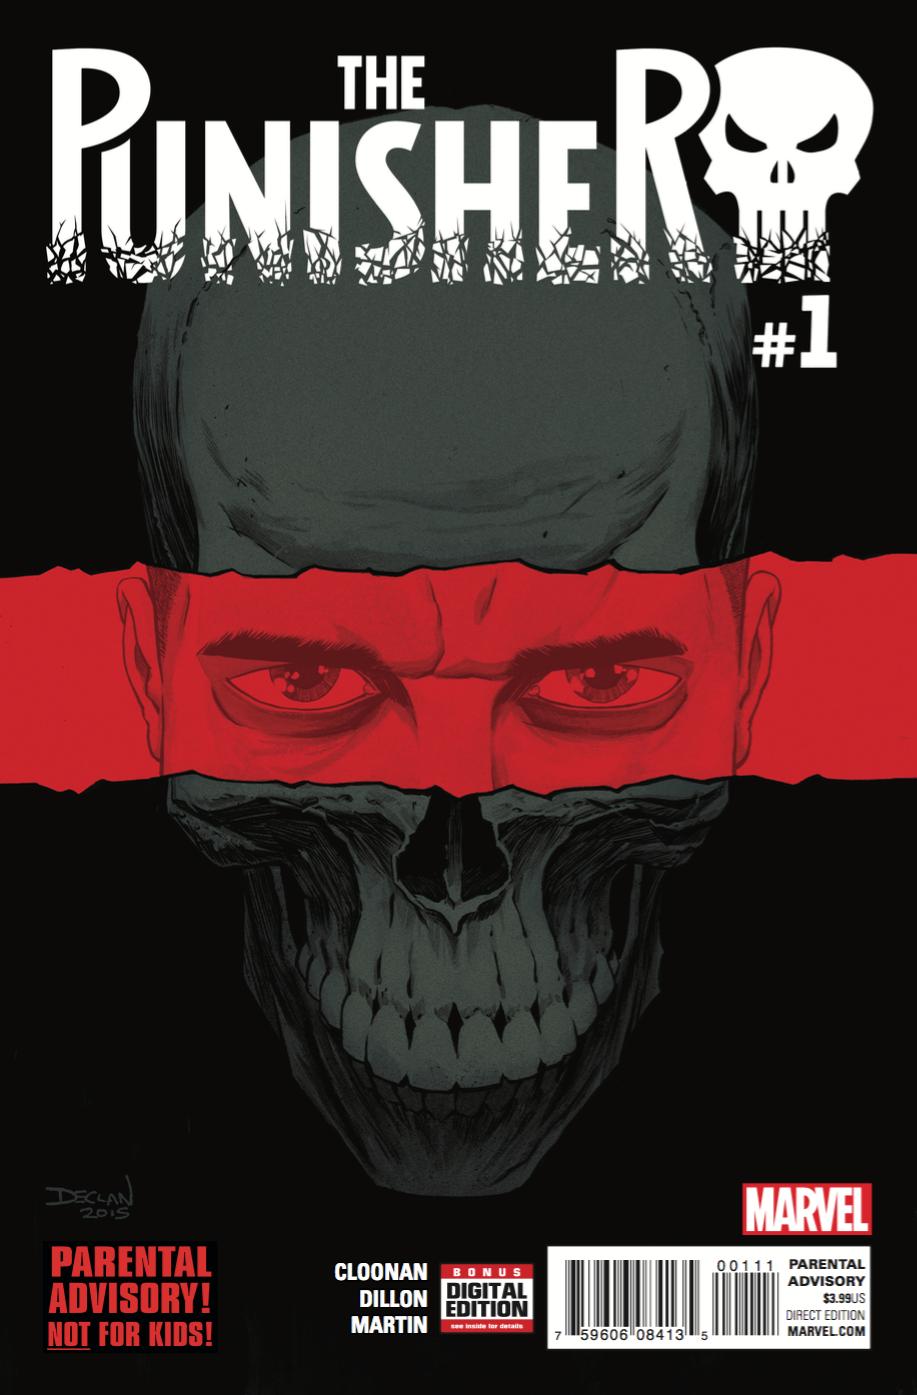 Marvel's New Punisher Comic Gives Frank Castle Big New Problems